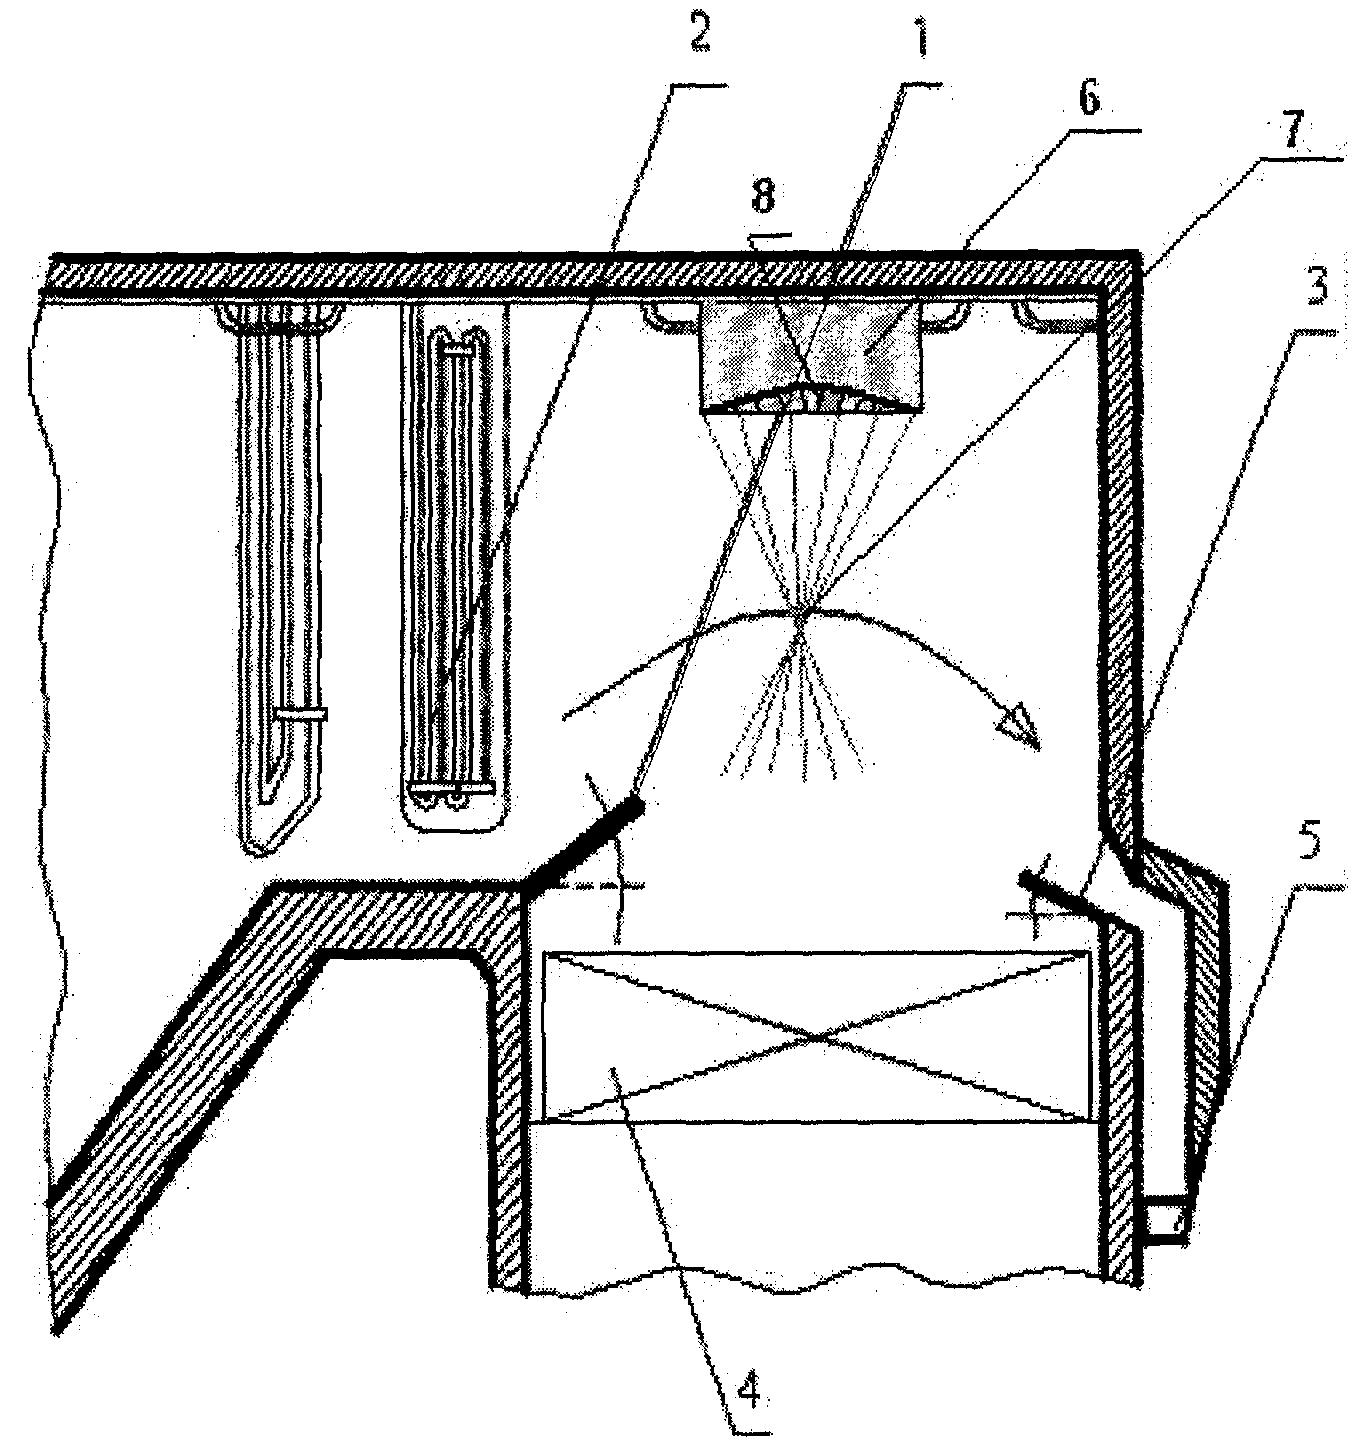 Ru73716u1 Ultrasonic Inertial Ash Collector Google Patents Generator Schematic Technical Term Know Figure 00000001